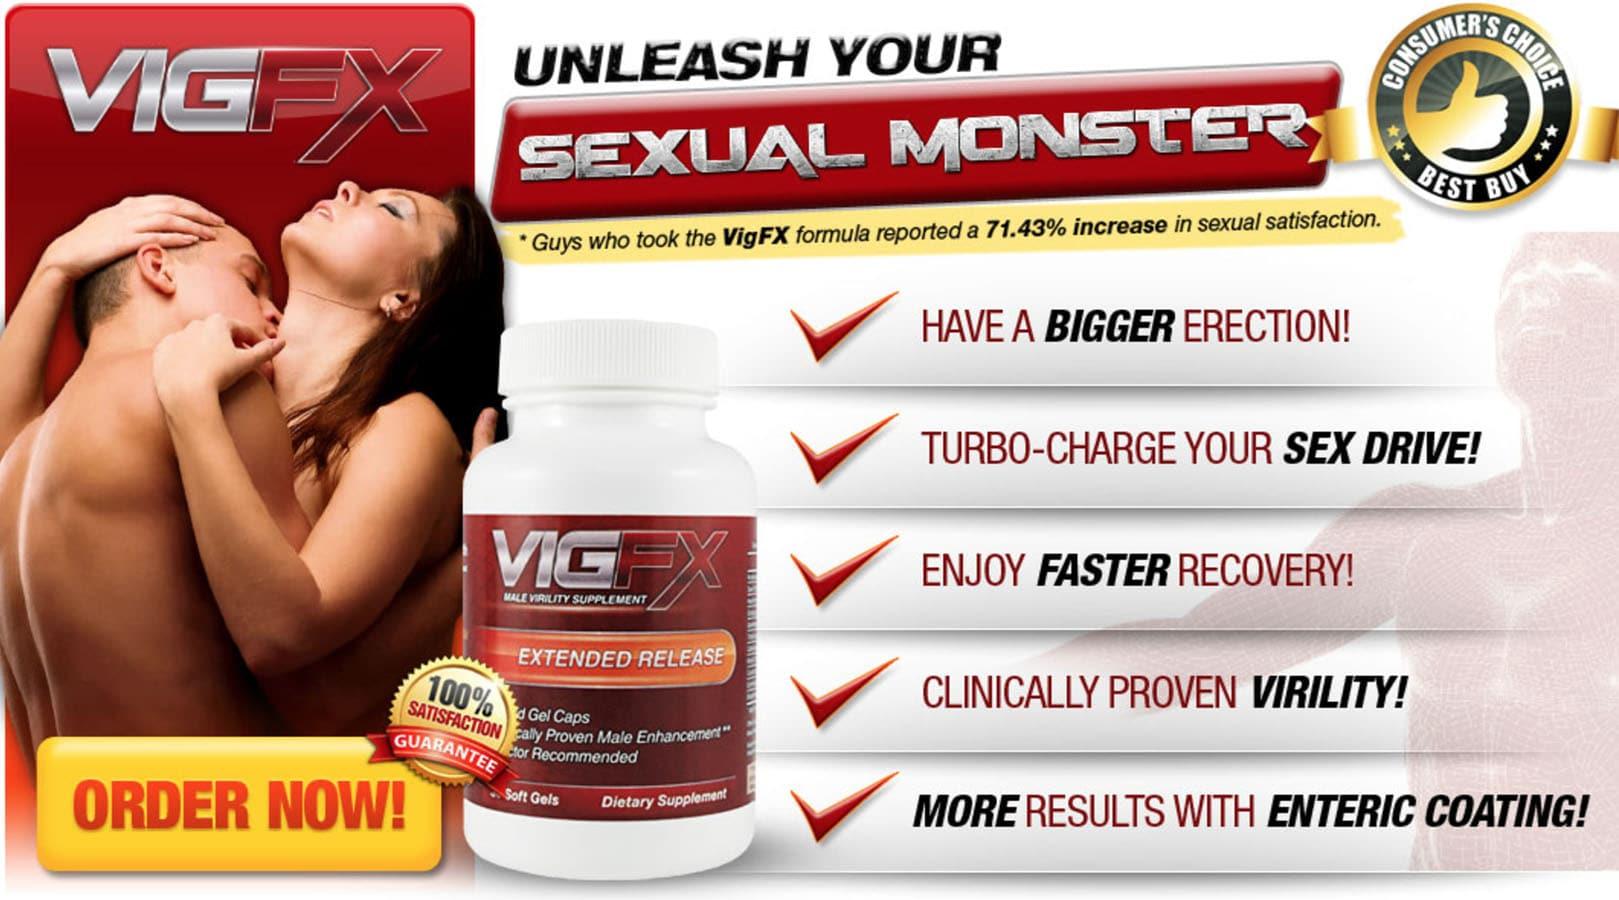 VigFX Uk Website